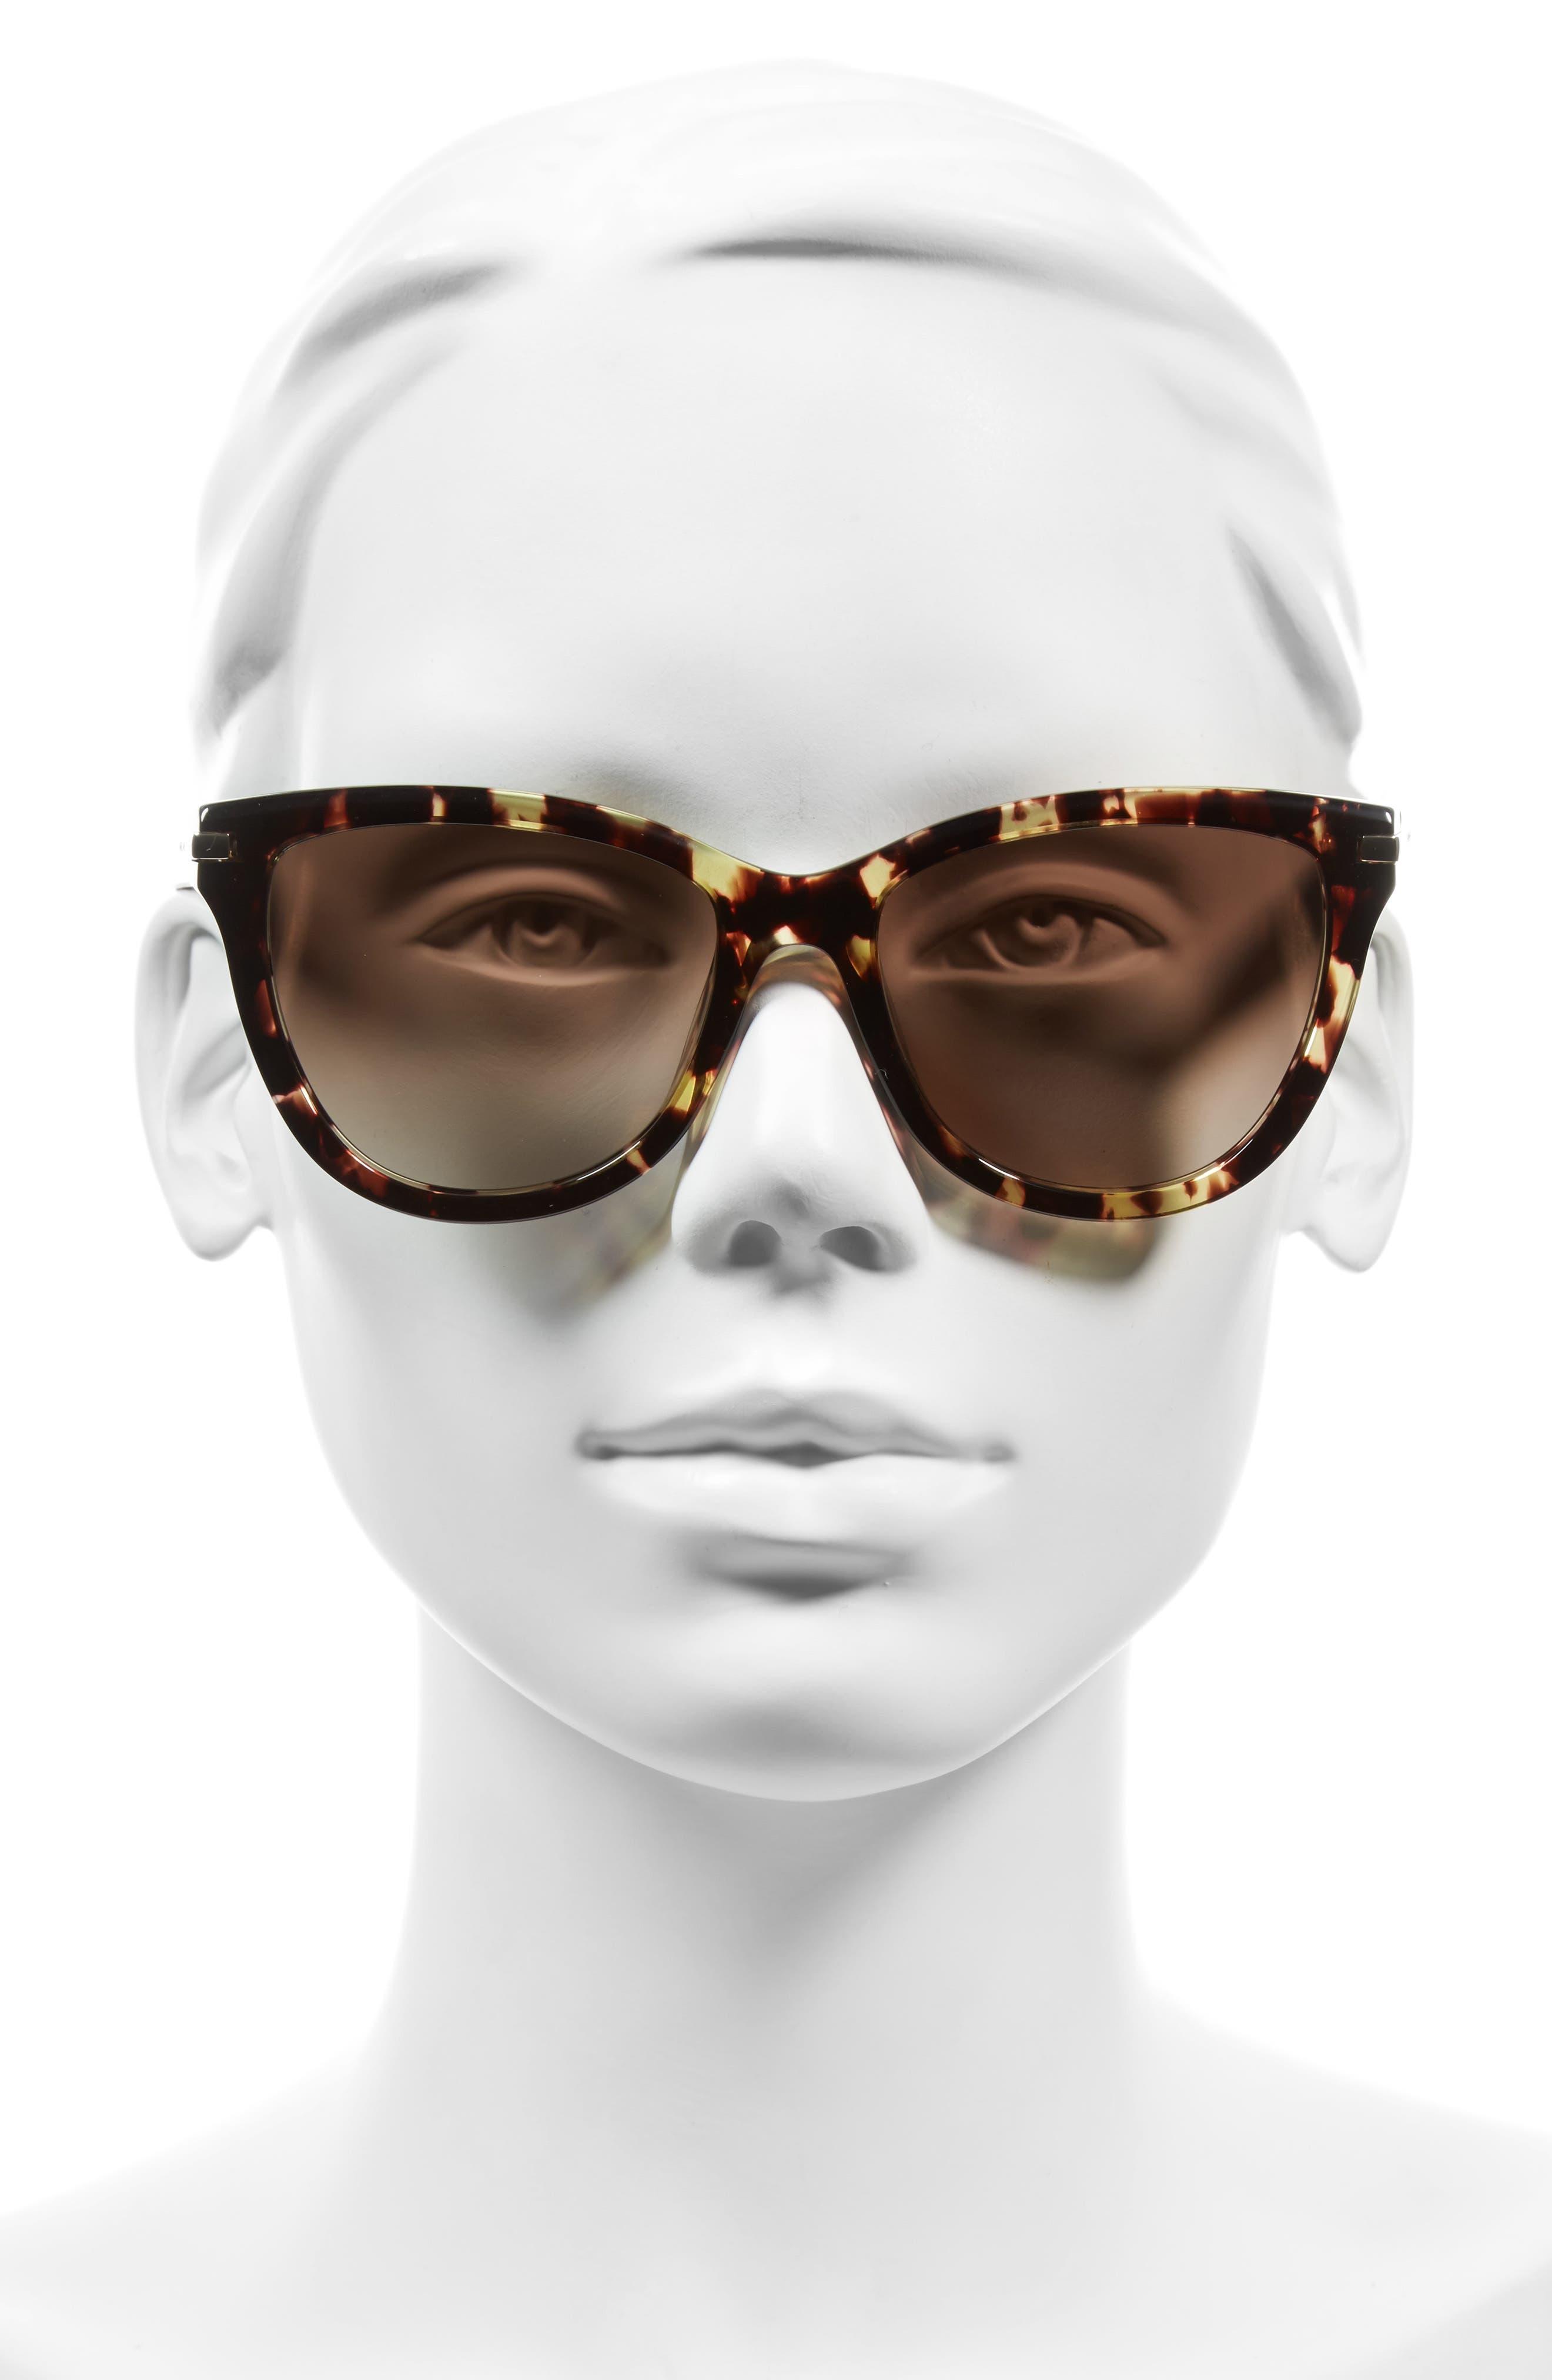 MARC JACOBS,                             54mm Sunglasses,                             Alternate thumbnail 2, color,                             CRYSTAL HAVANA